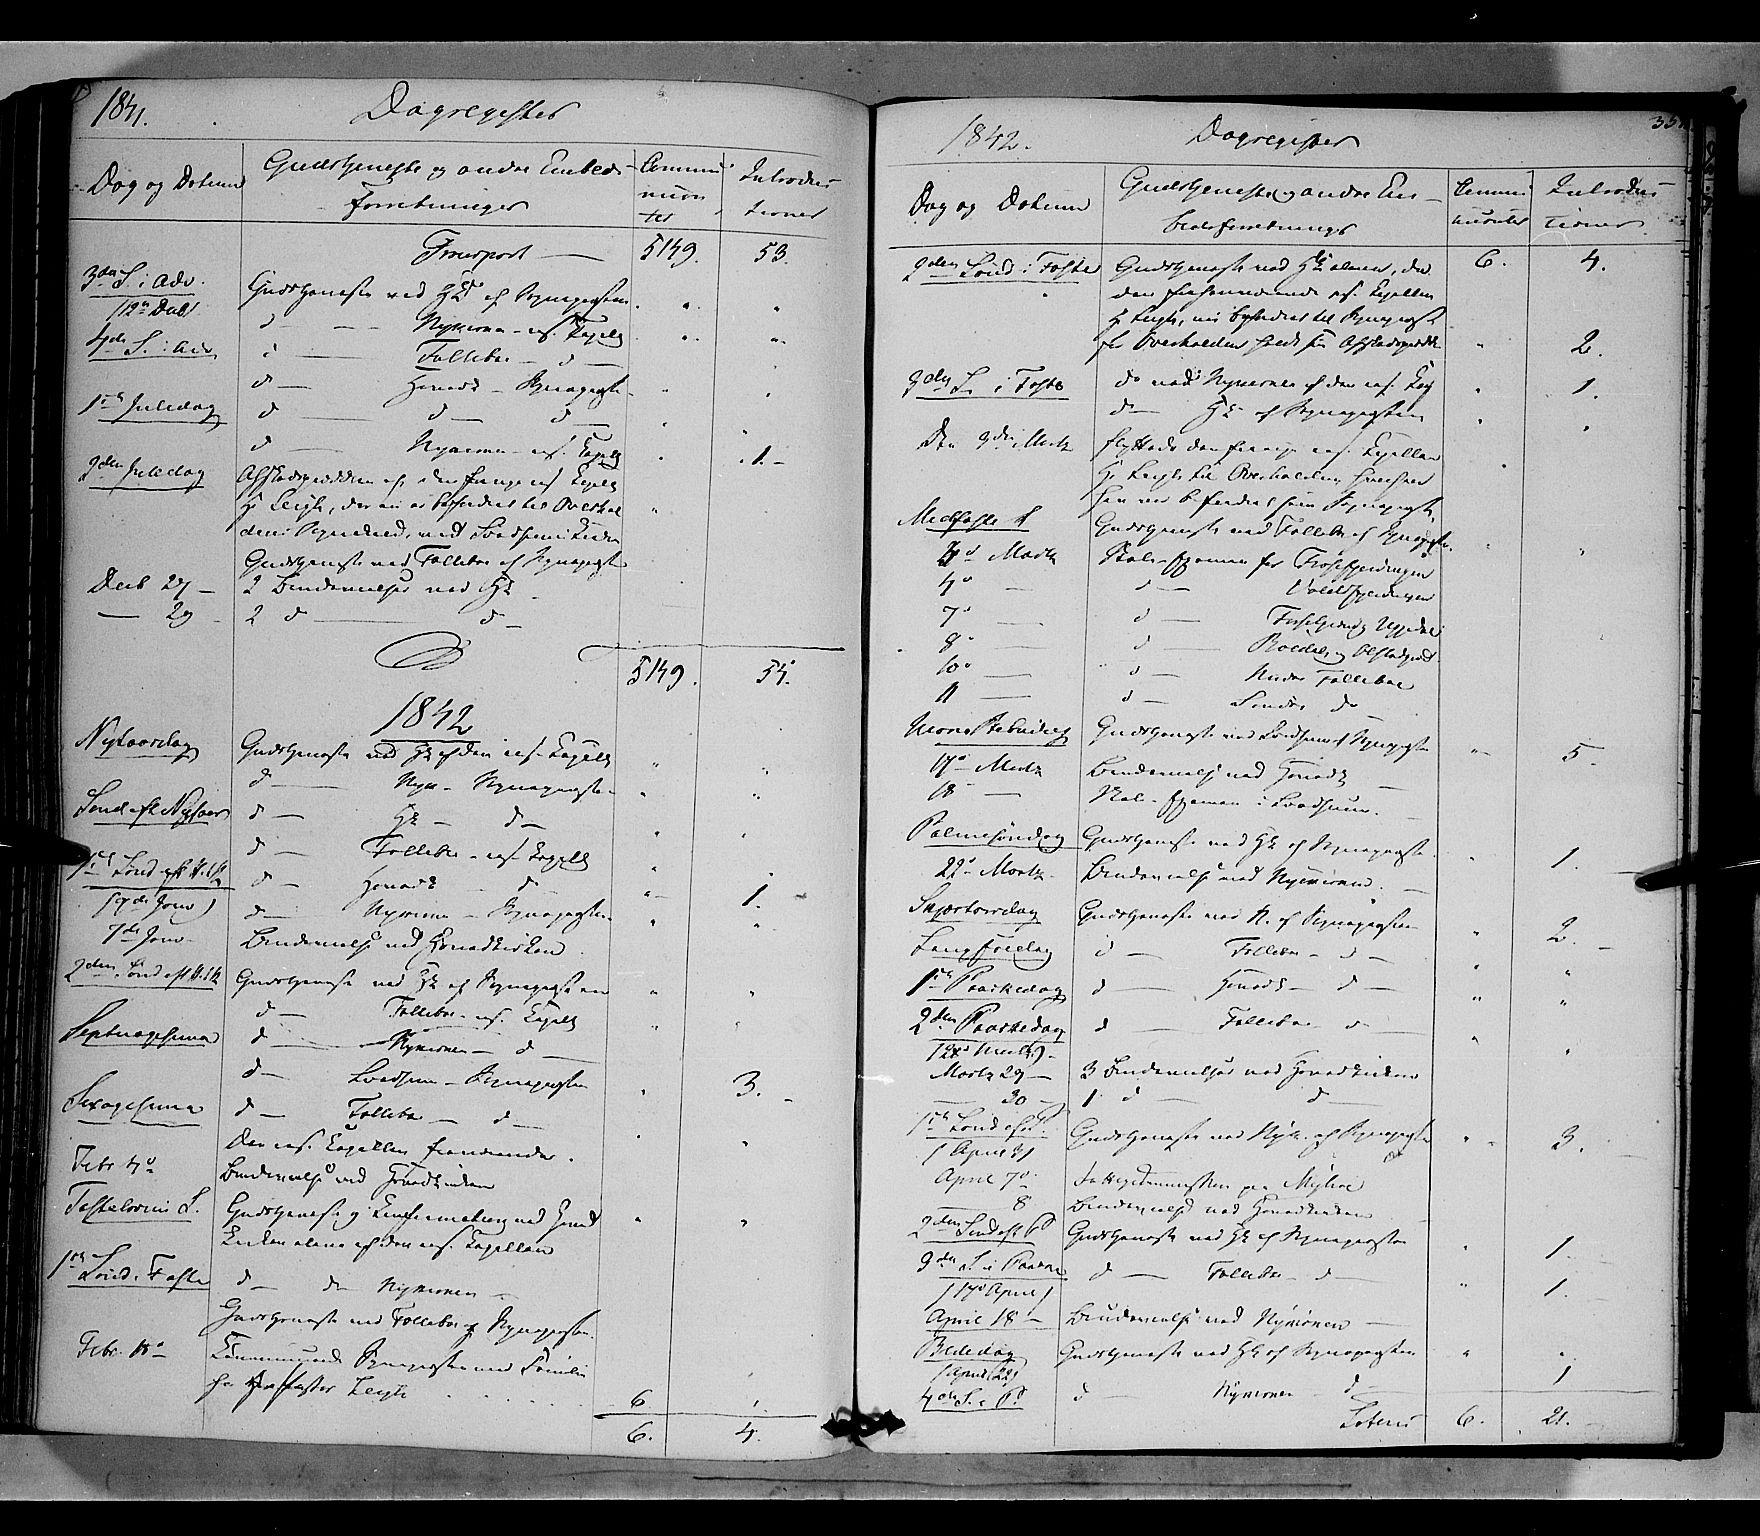 SAH, Gausdal prestekontor, Ministerialbok nr. 7, 1840-1850, s. 357